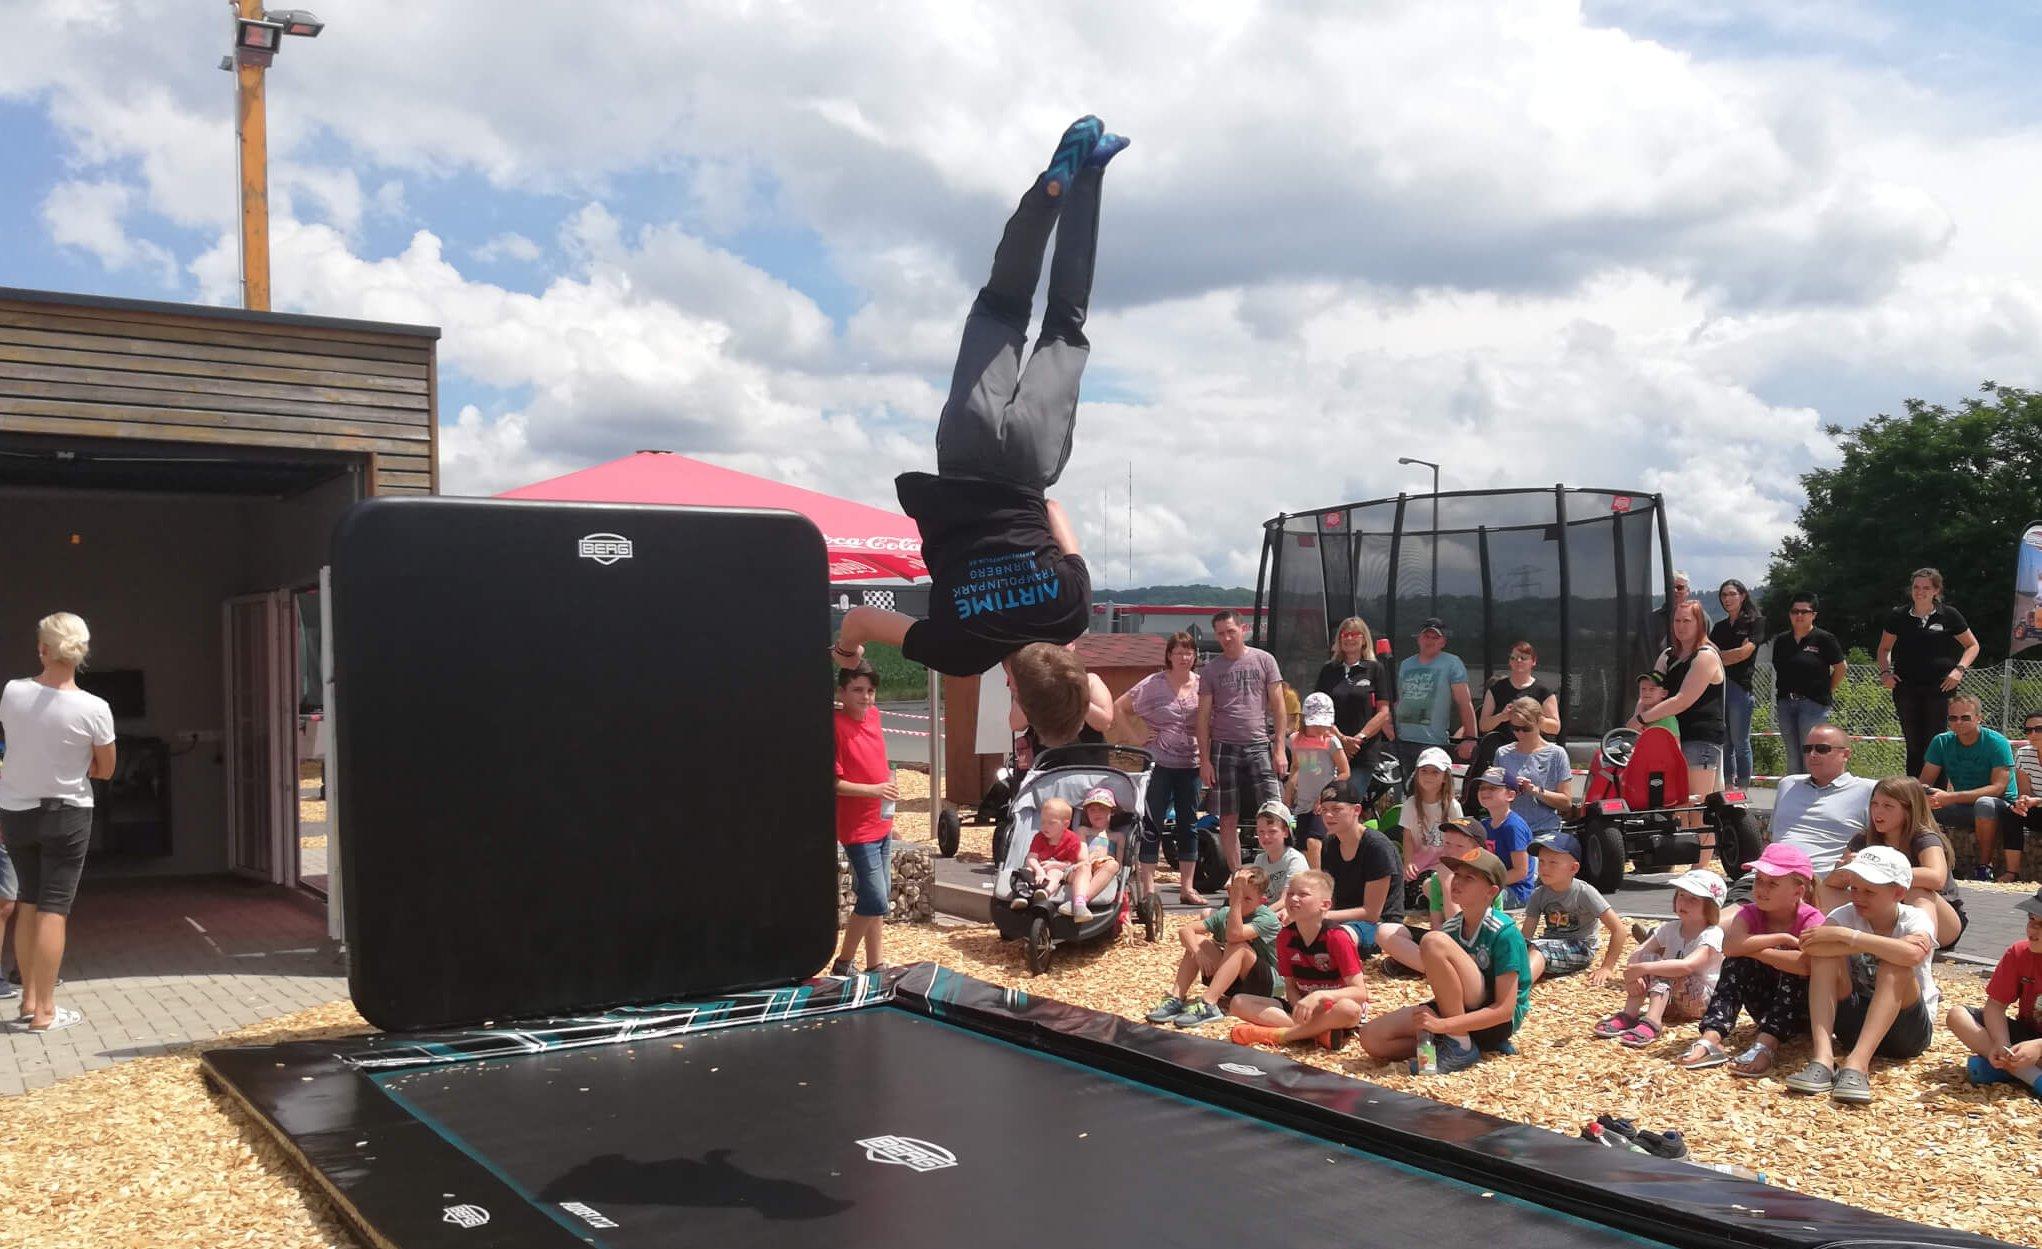 BERG Experience Day - Rückblick - Event 2019 bei trampolin-profi.de